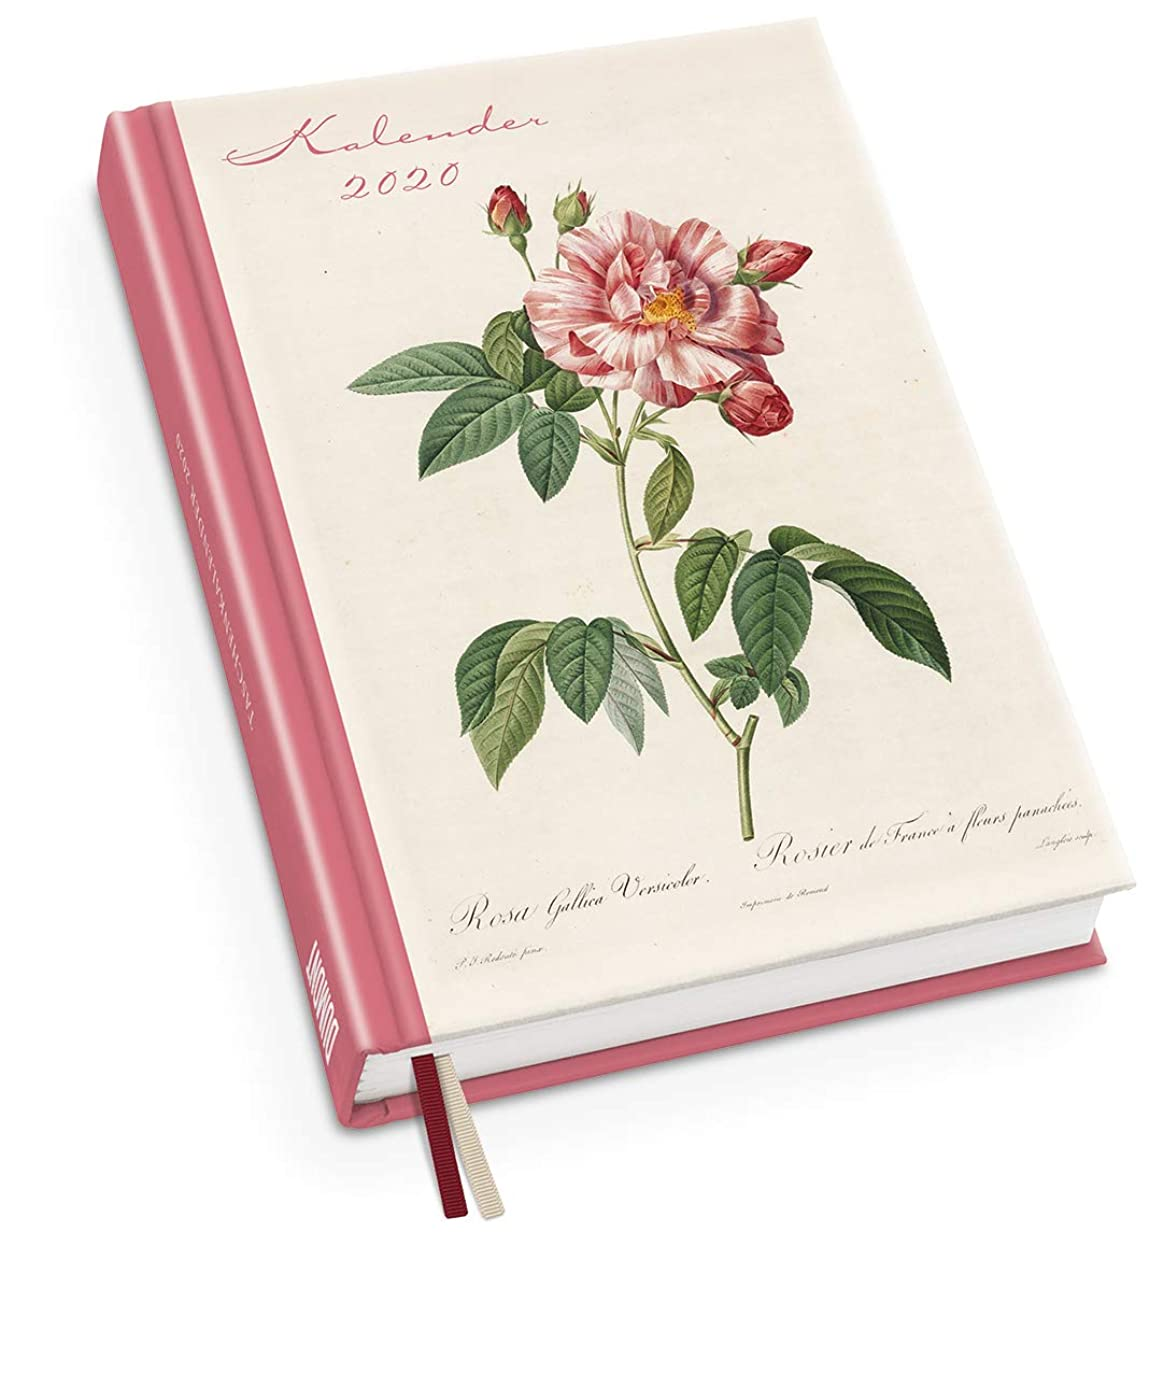 不規則なの頭の上端Redoutés Rosen Taschenkalender 2020 - Terminplaner mit Wochenkalendarium - Format 11,3 x 16,3 cm